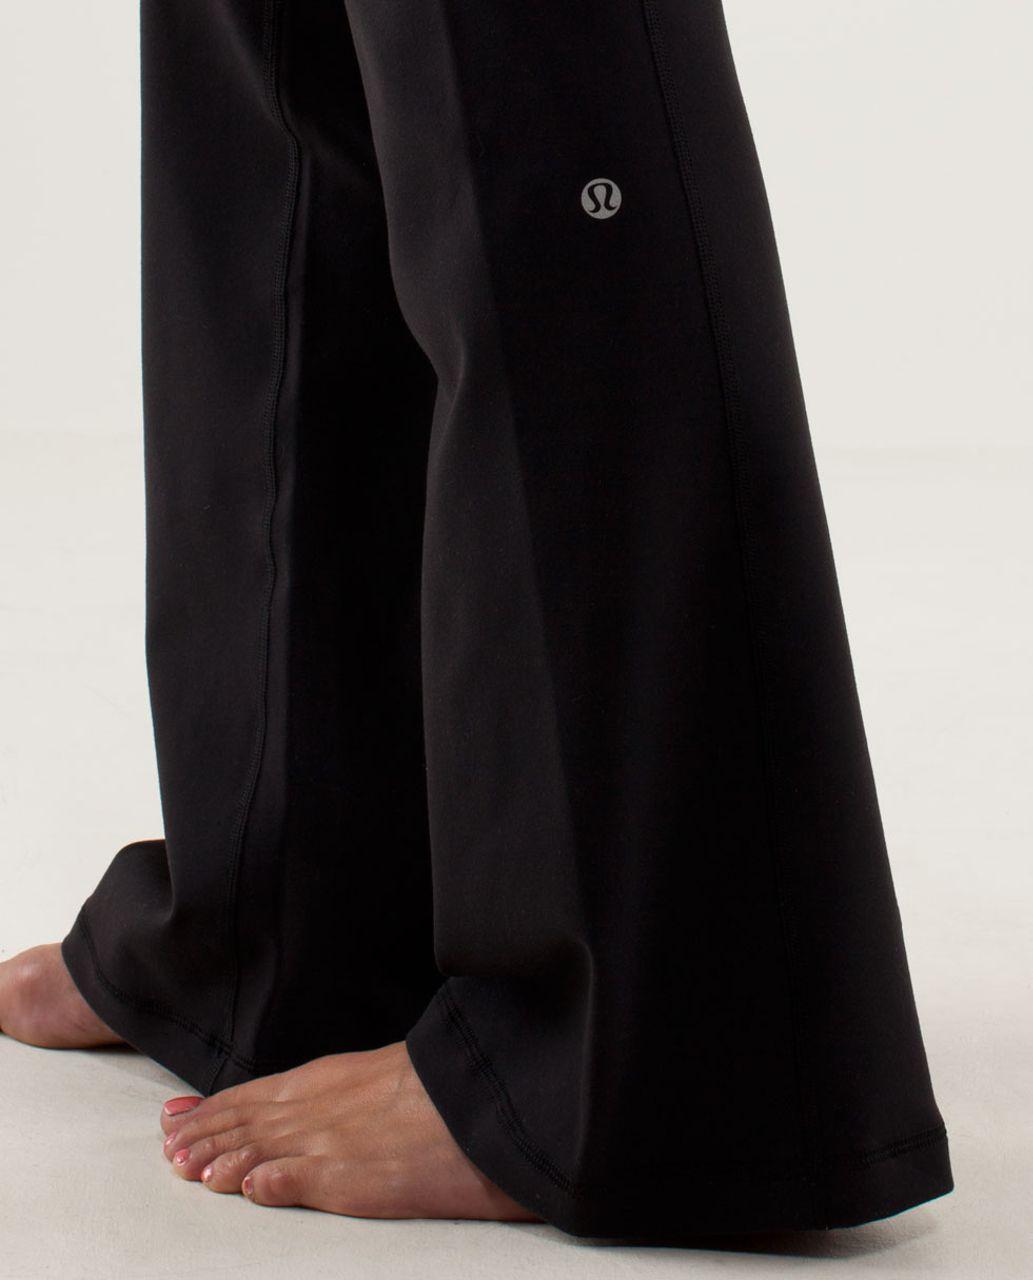 Lululemon Groove Pant (Tall) - Black / Quilt Summer13 10